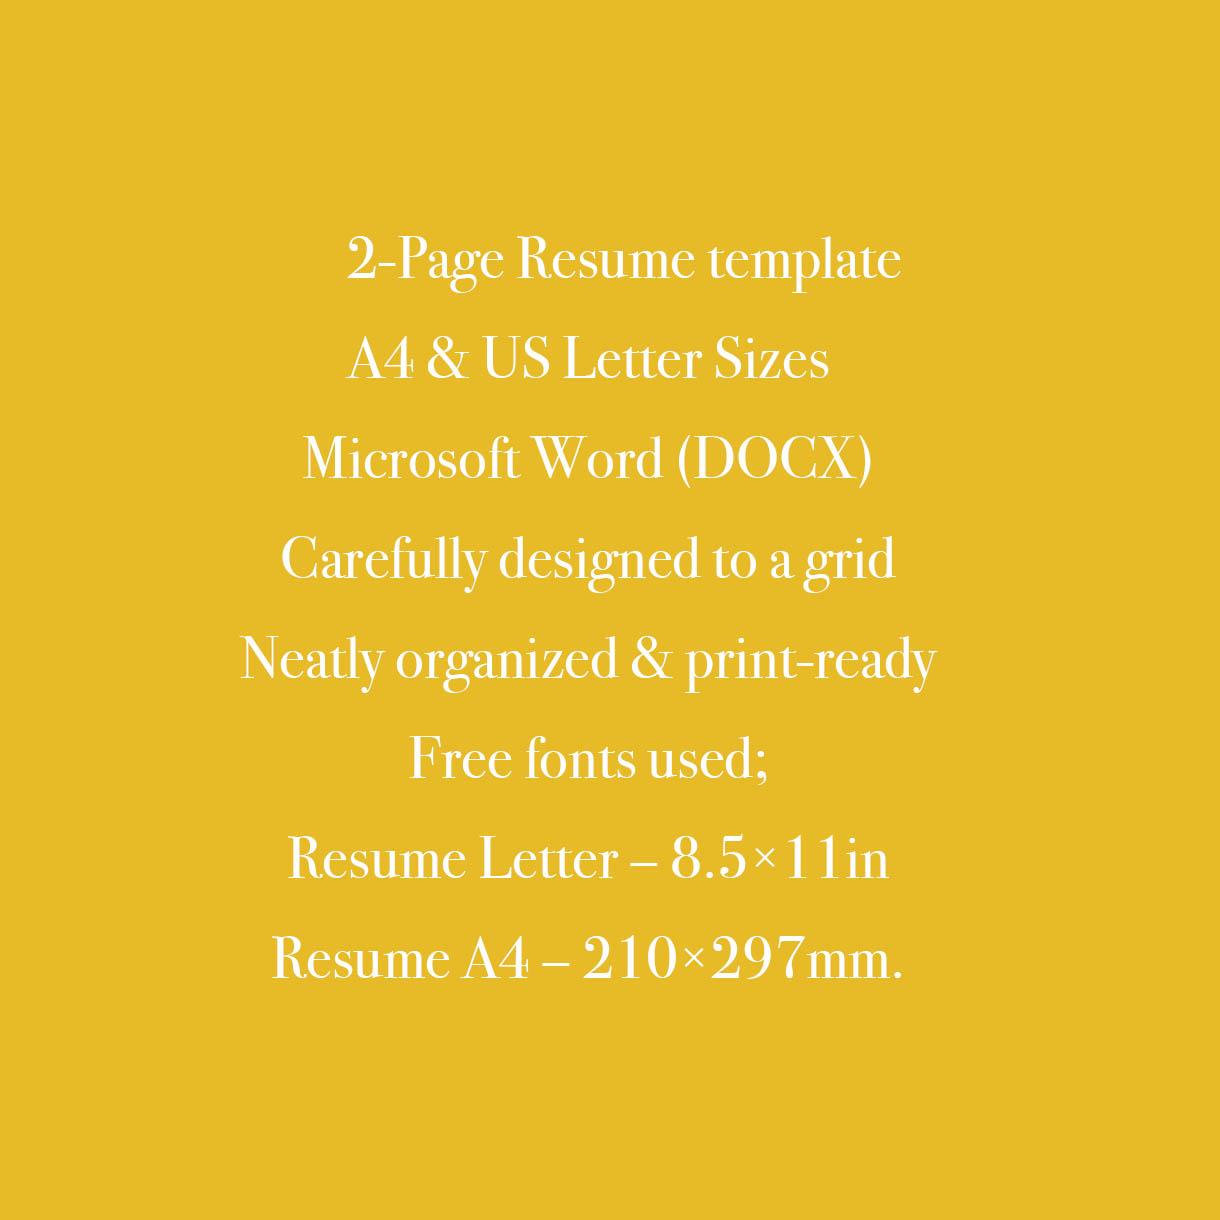 Financial Advisor CV Resume Template cover image.